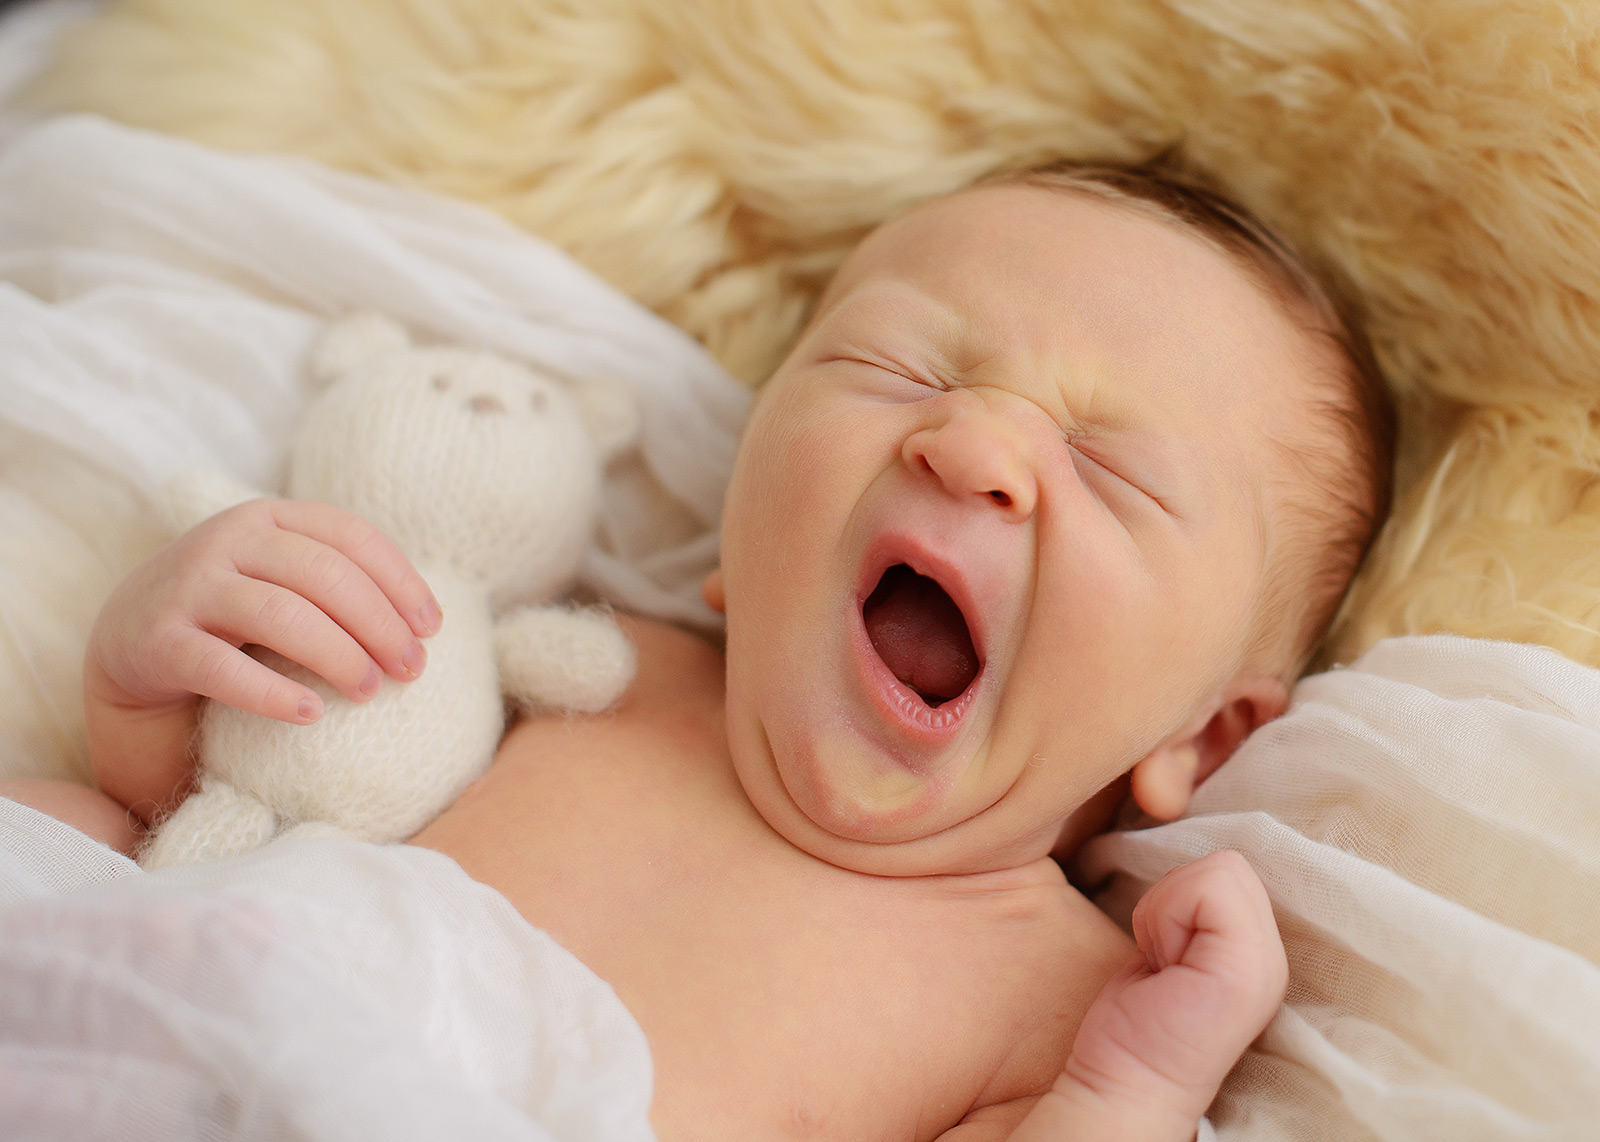 Newborn baby boy yawning on fur throw